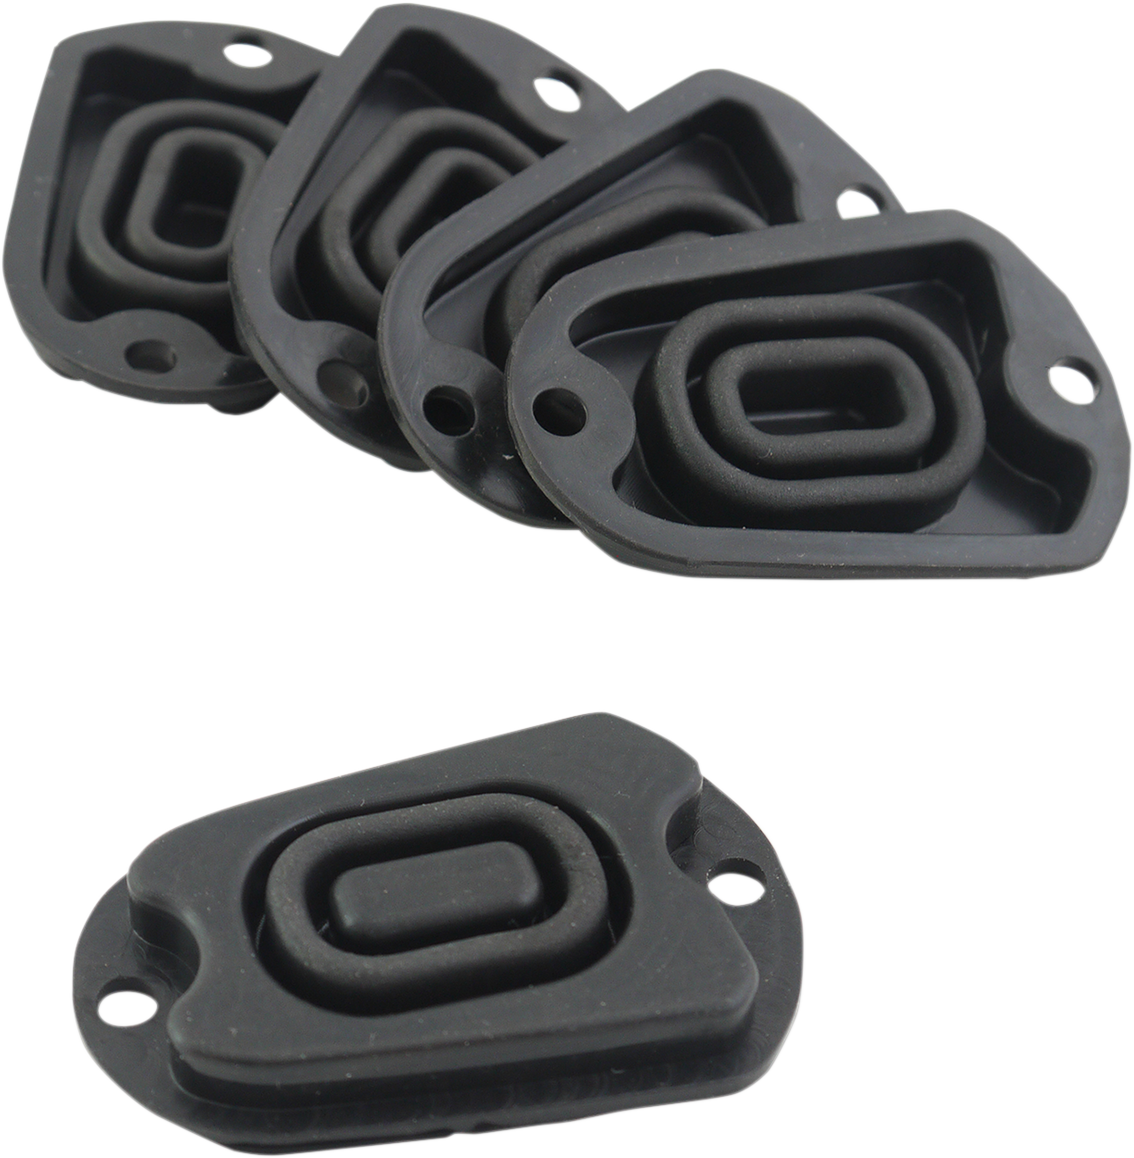 Drag Specialties Single Rear Master Cylinder Gasket for 14-17 Harley Sportster